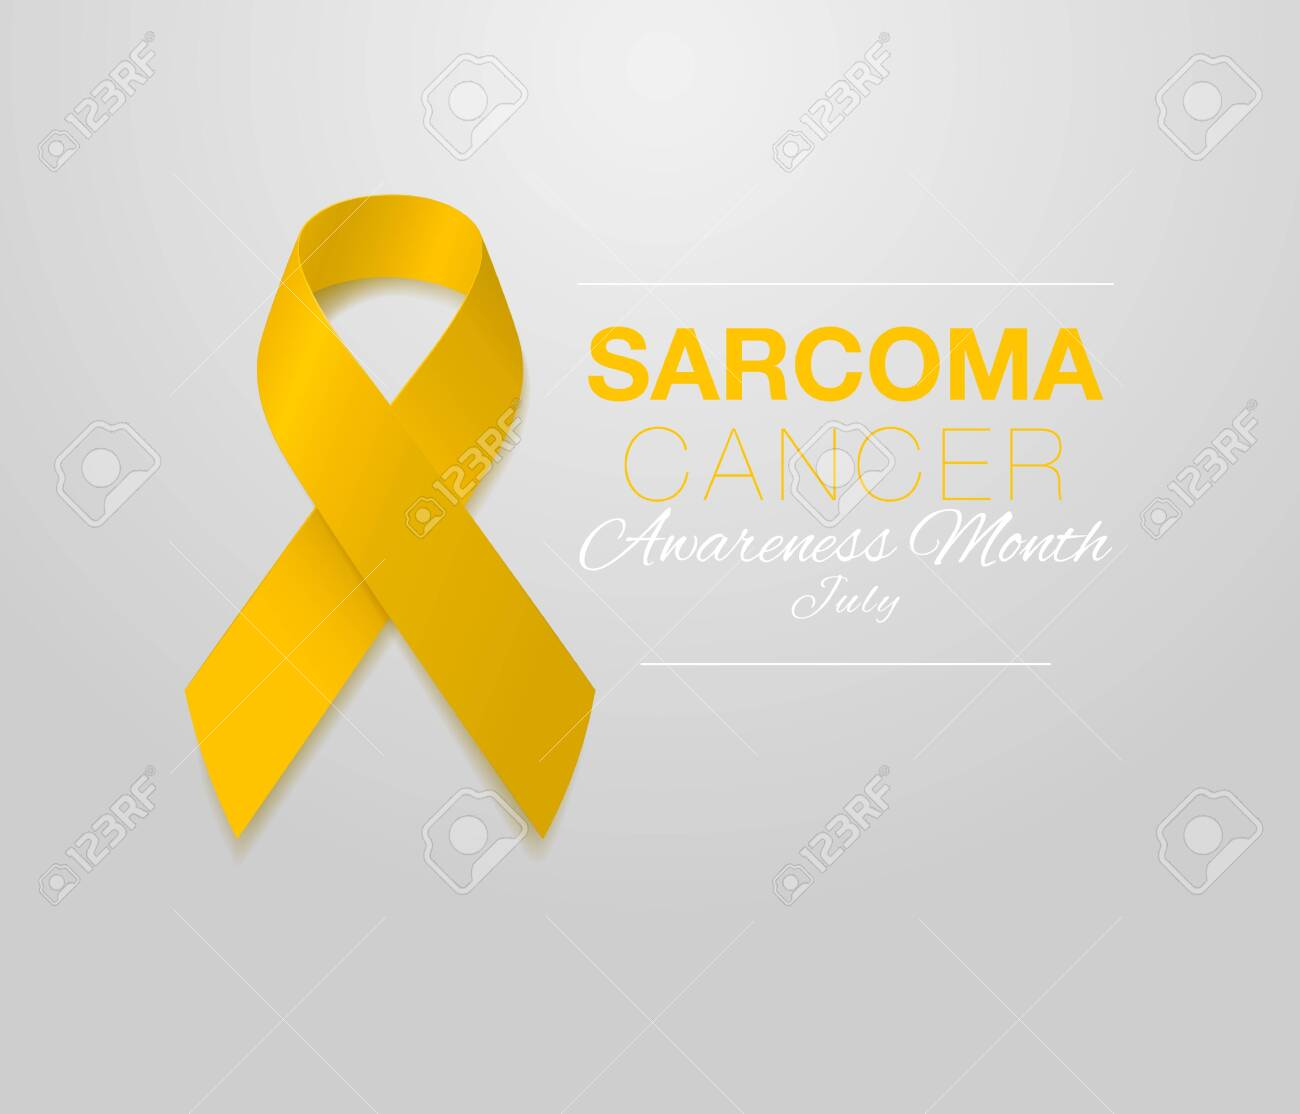 sarcoma cancer awareness month specialiste papillomavirus homme